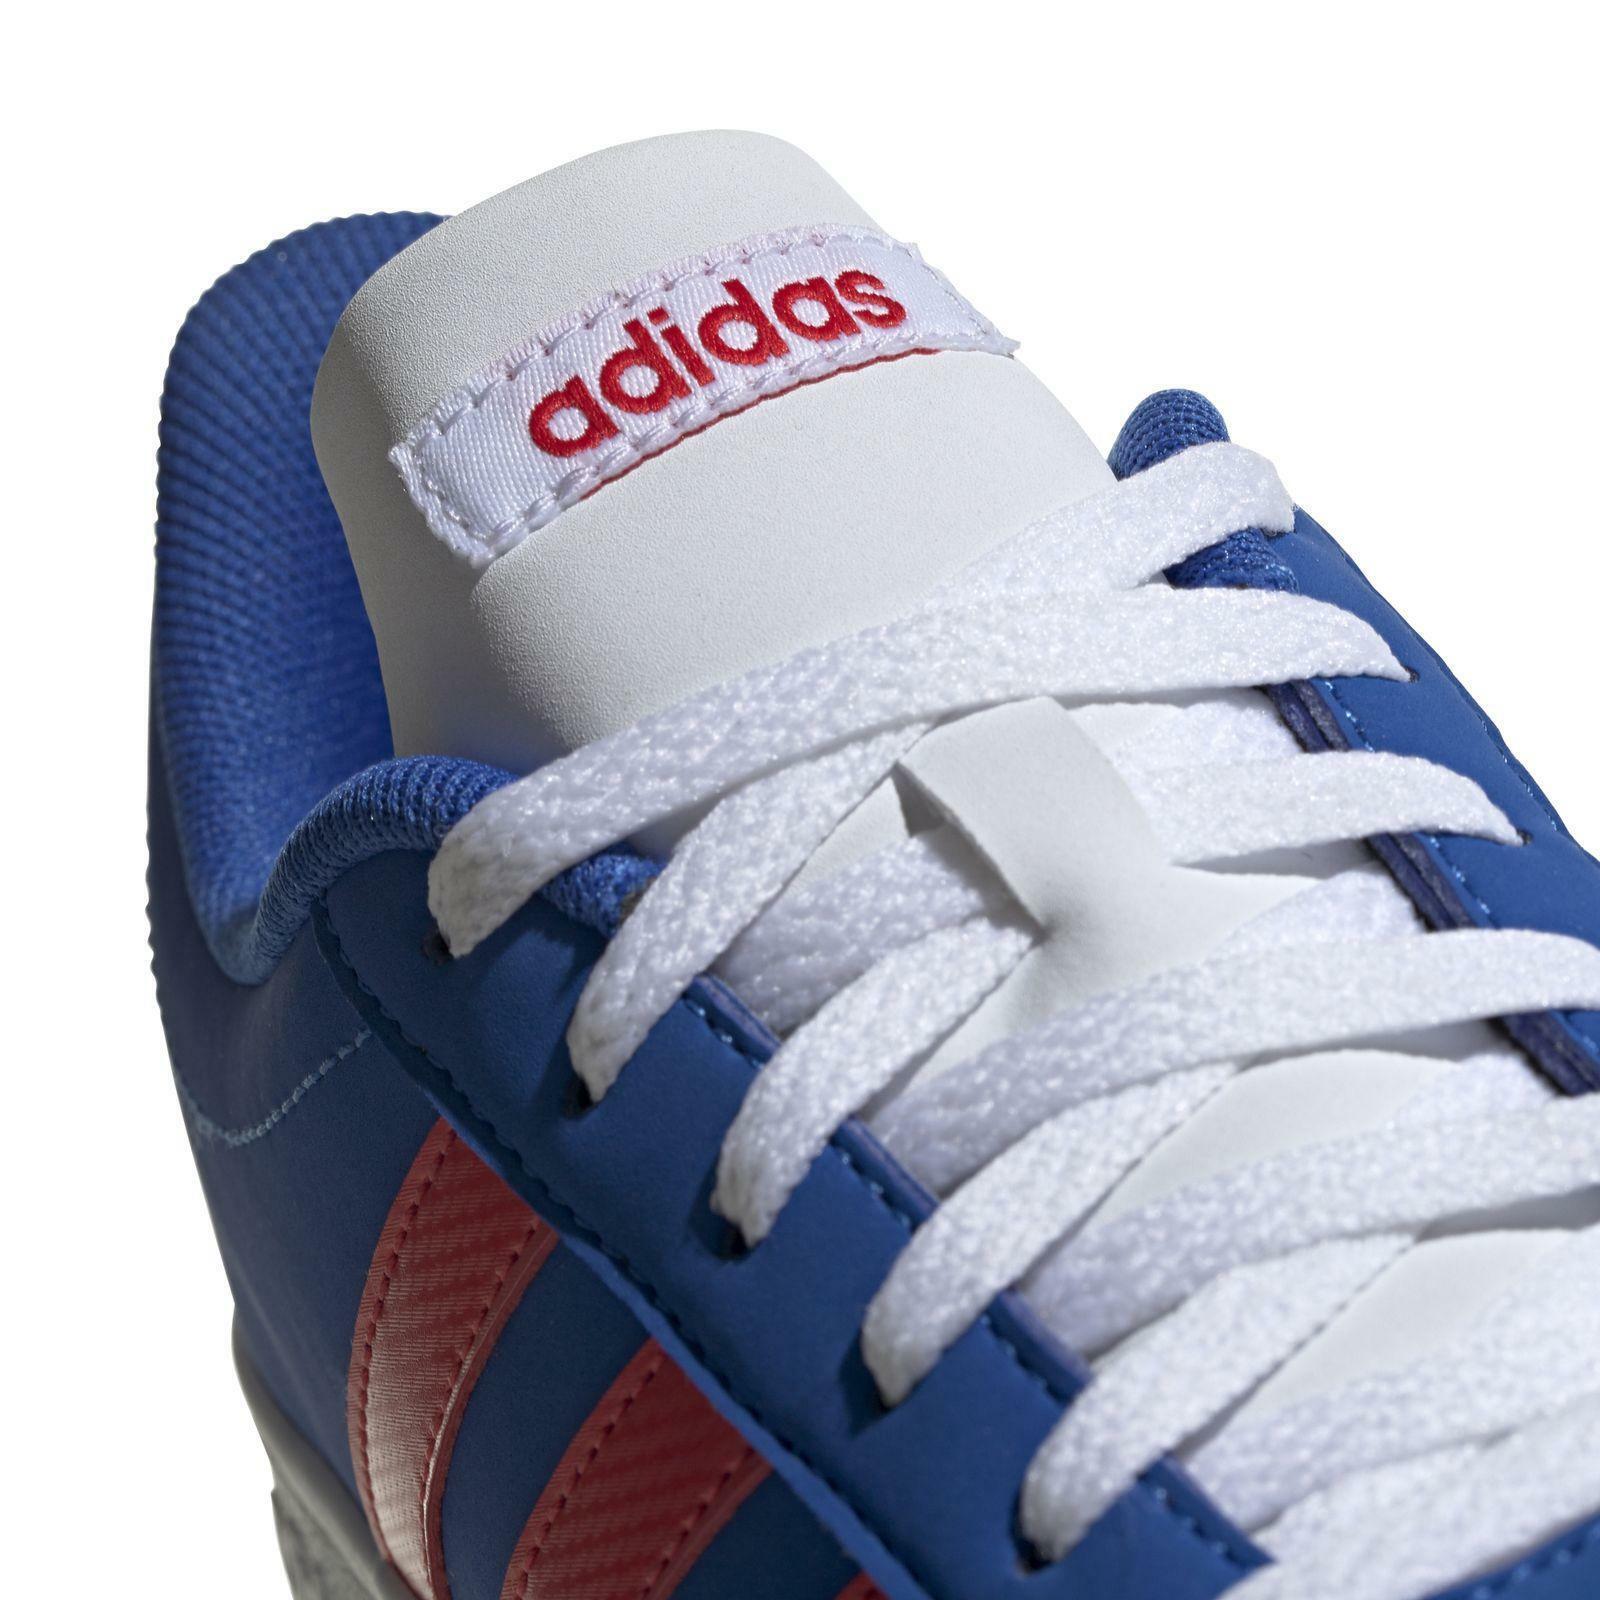 adidas adidas vl court 2.0 k bambino ee6902 blu sneakers bambino